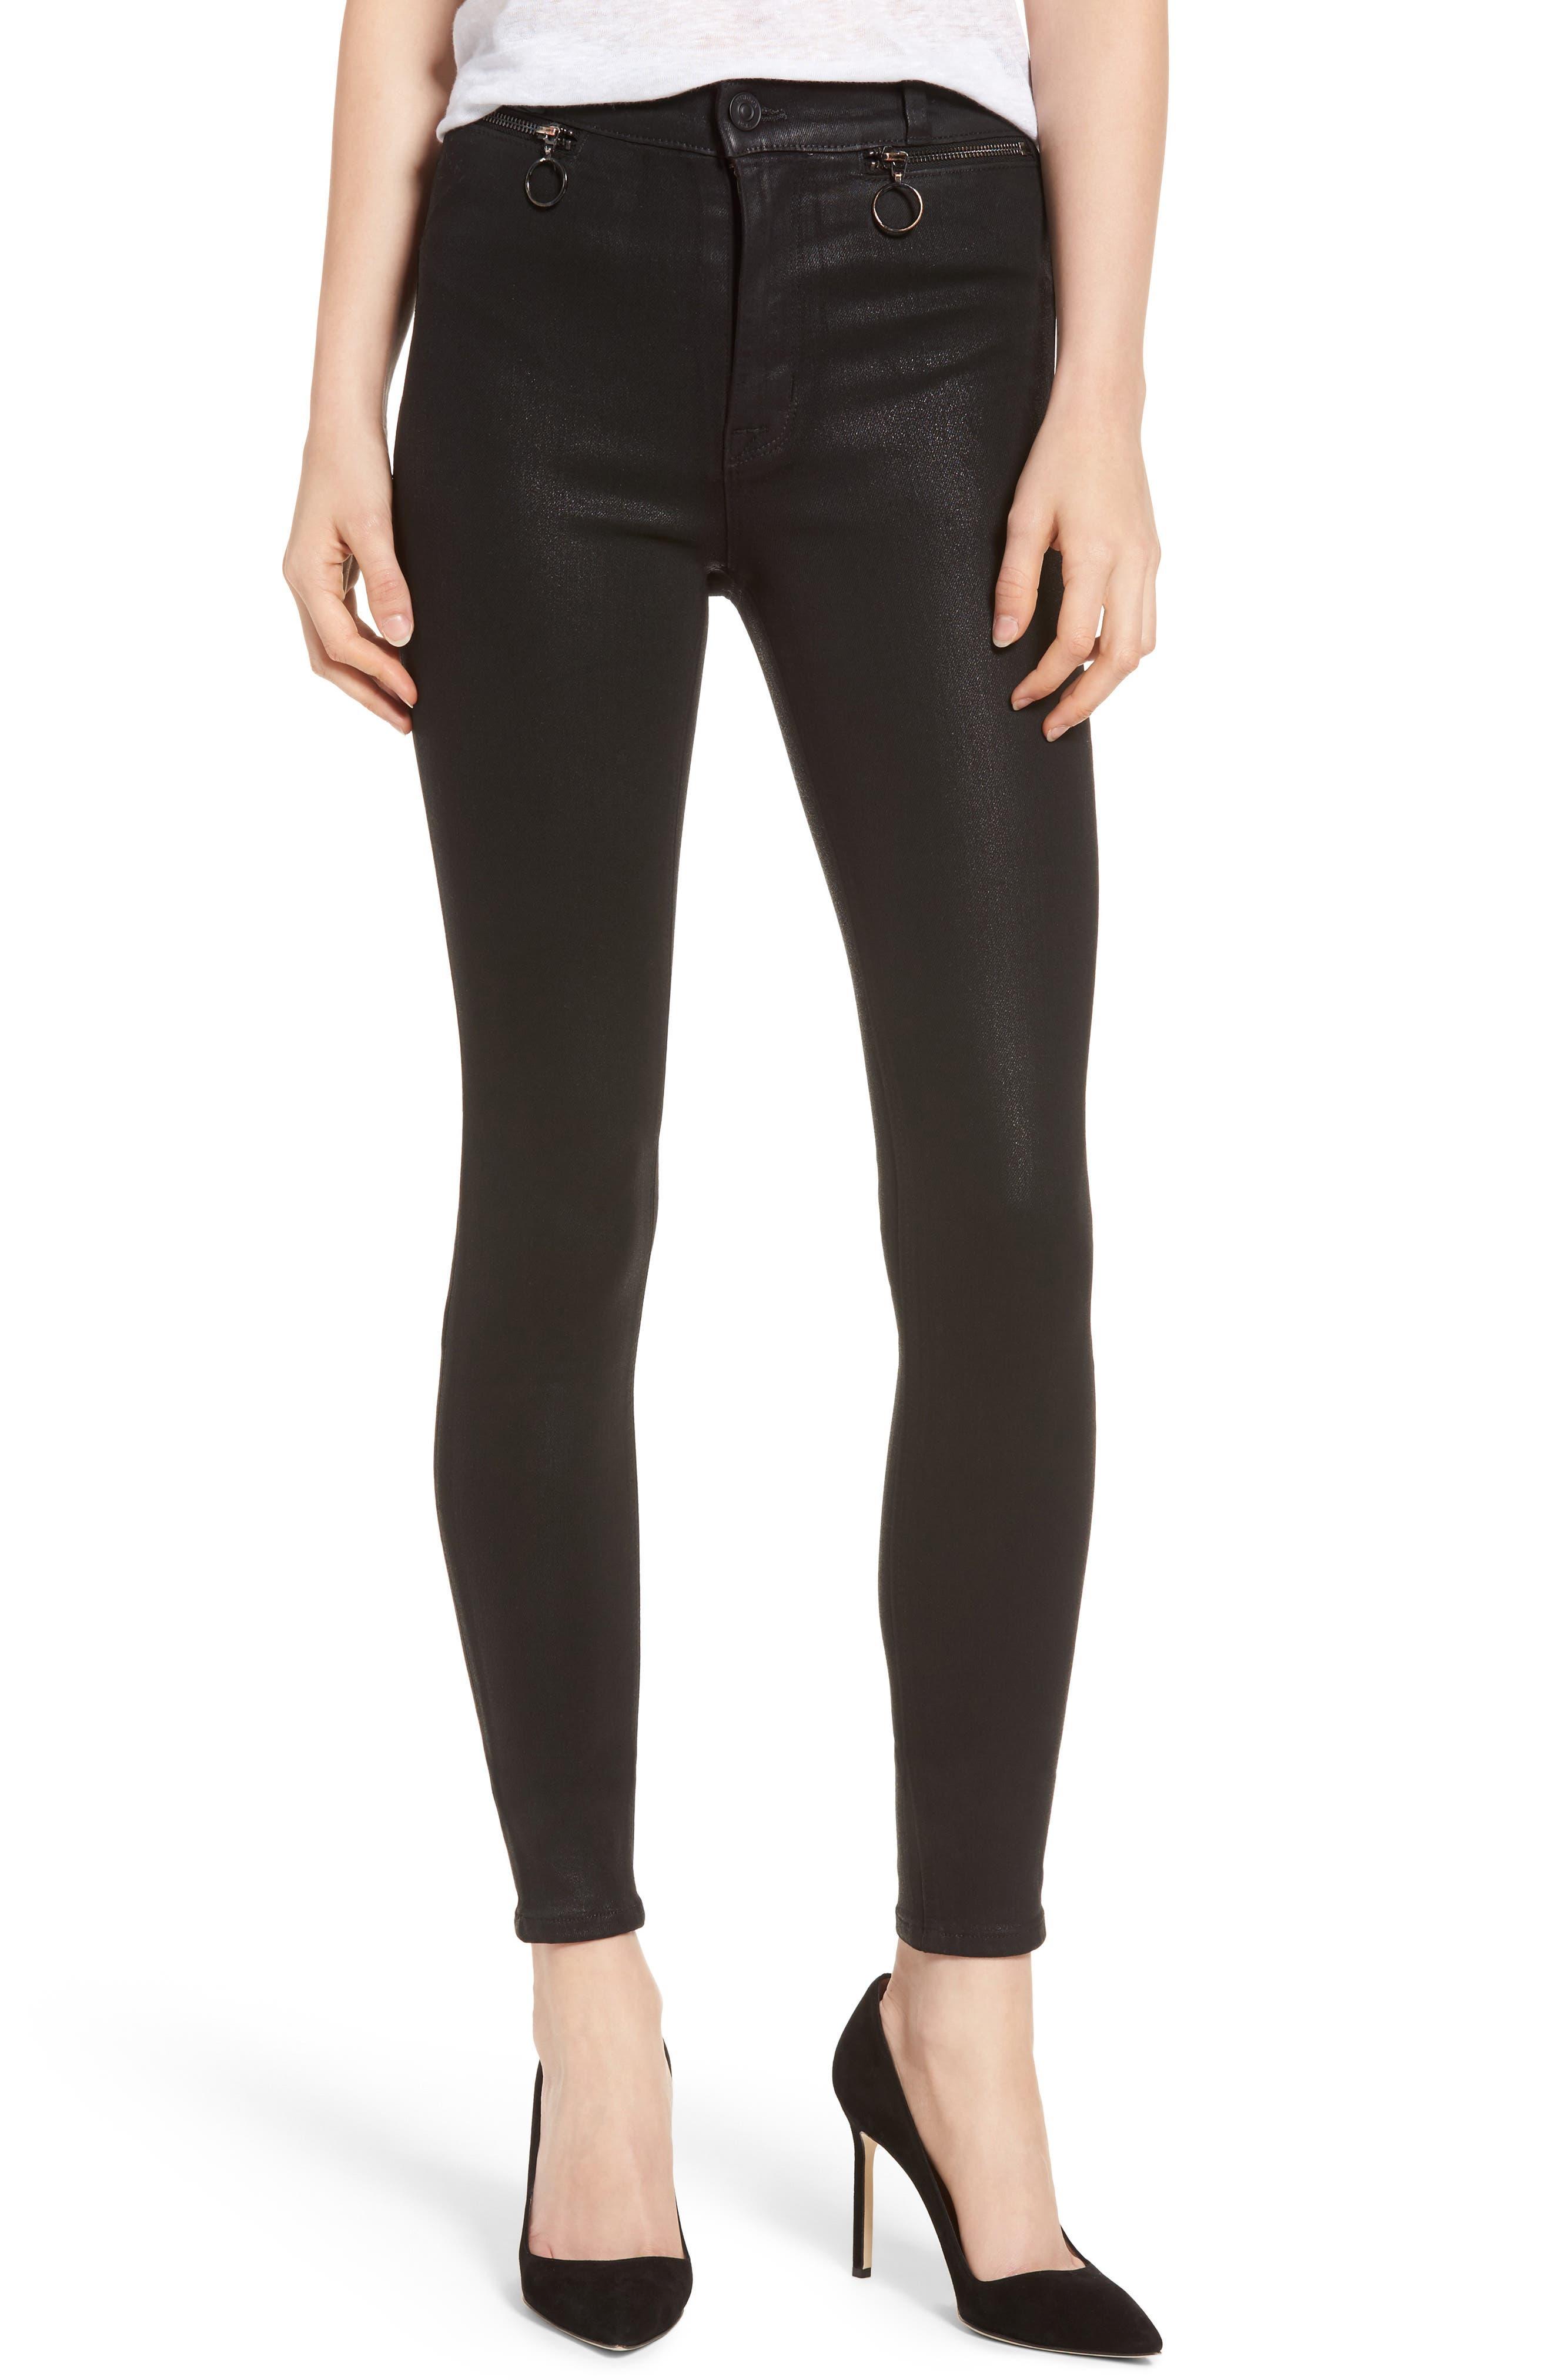 Kooper Coated Skinny Jeans,                         Main,                         color, Black Coated